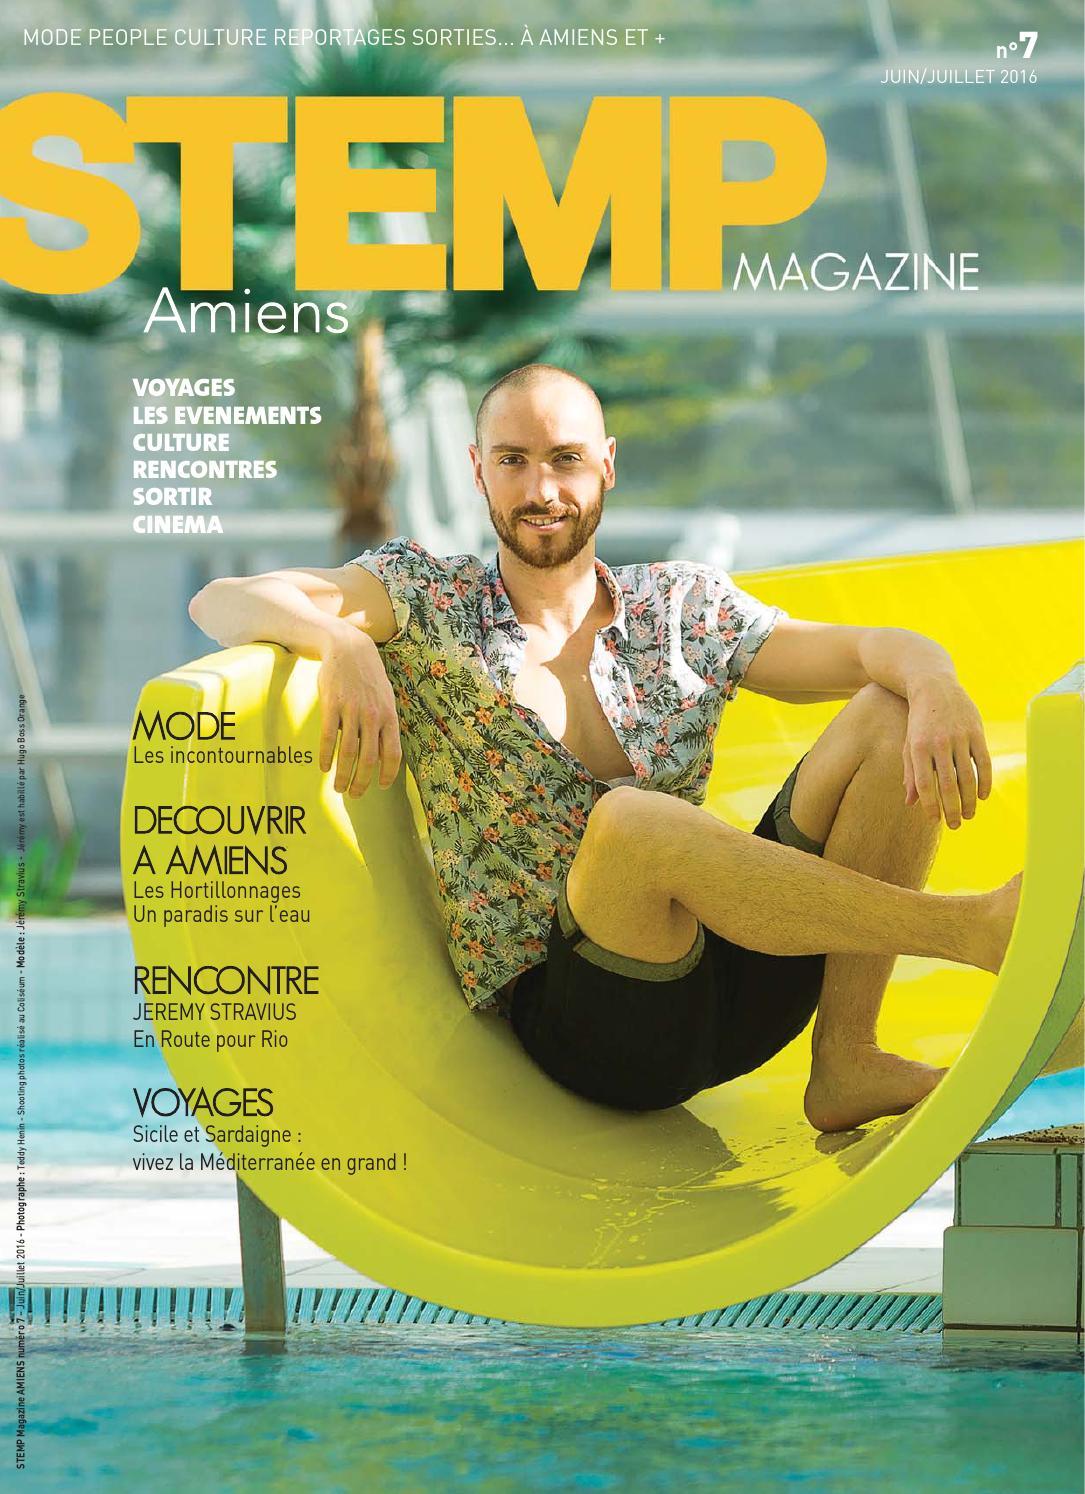 stemp magazine amiens 7 by stemp magazine issuu. Black Bedroom Furniture Sets. Home Design Ideas